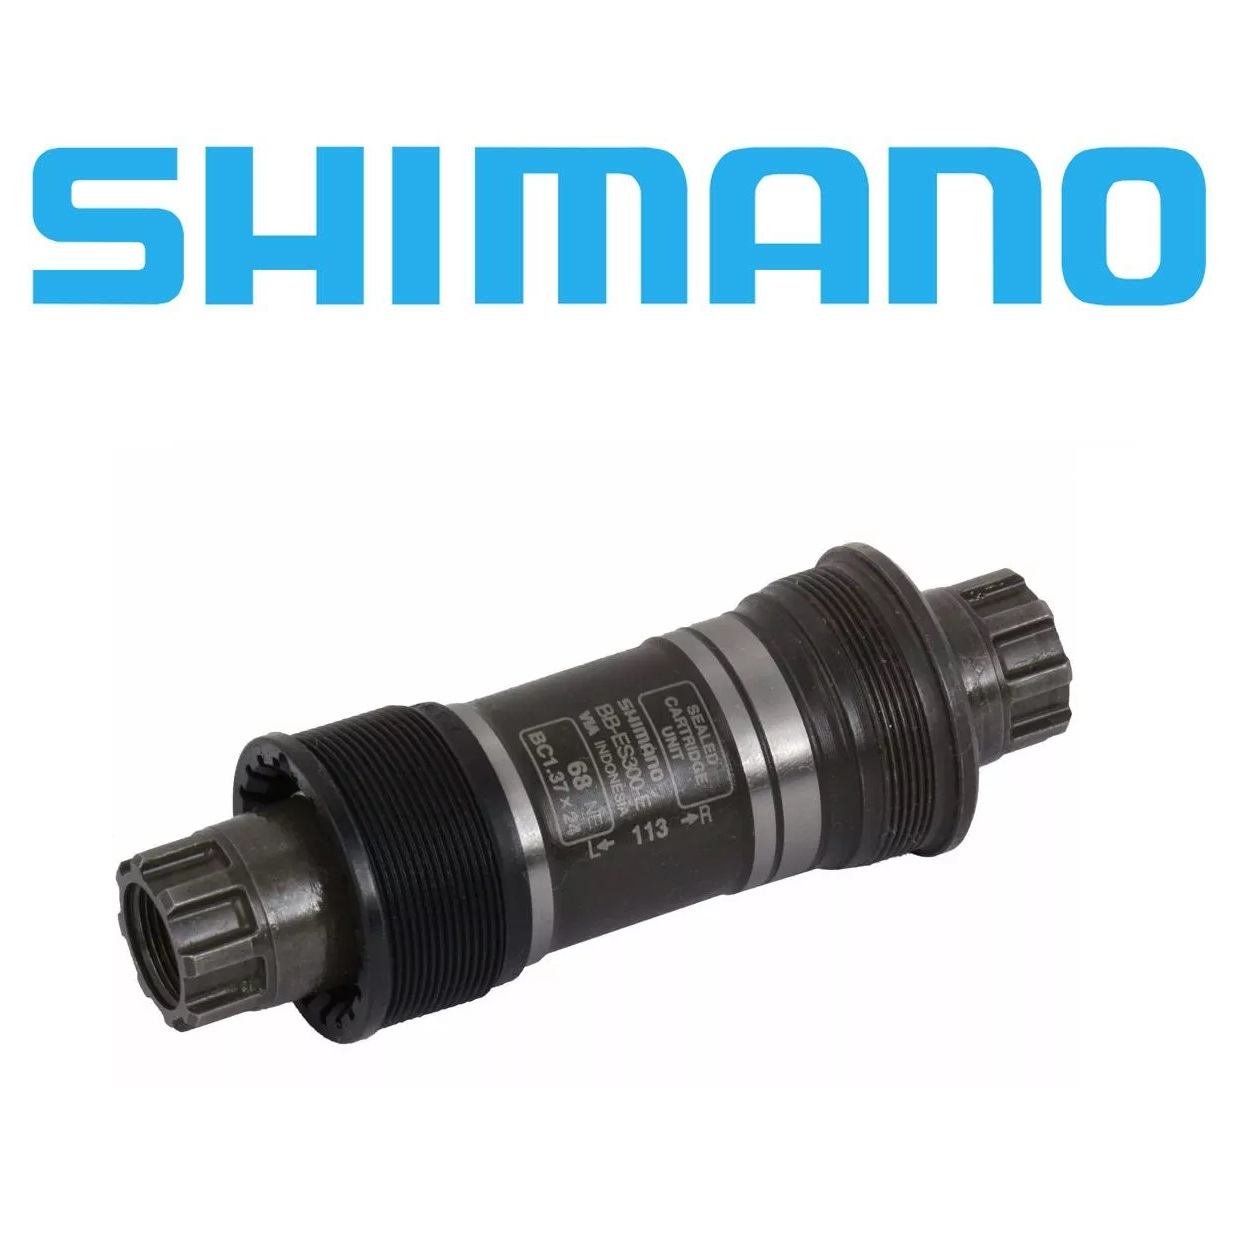 MOVIMENTO CENTRAL SHIMANO ACERA BB-ES300 BSA 113MM